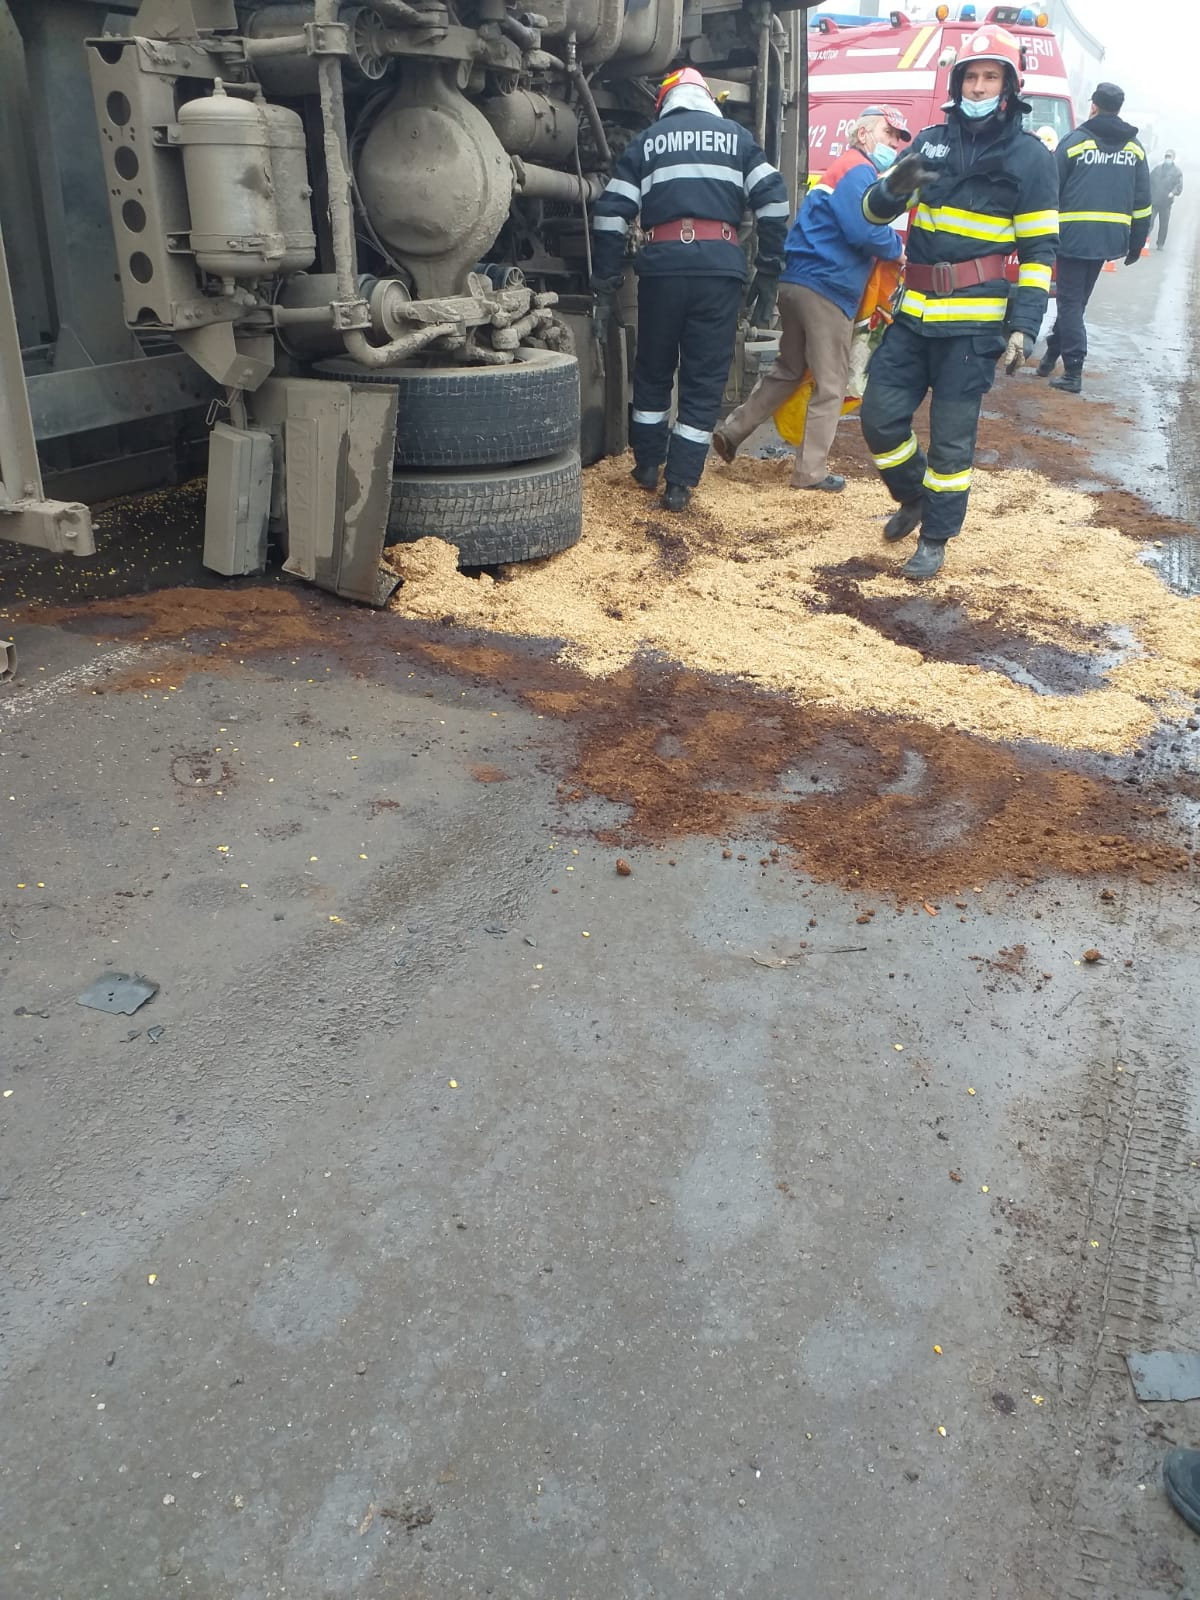 FOTO: Accident Buduslău 18.11.2020